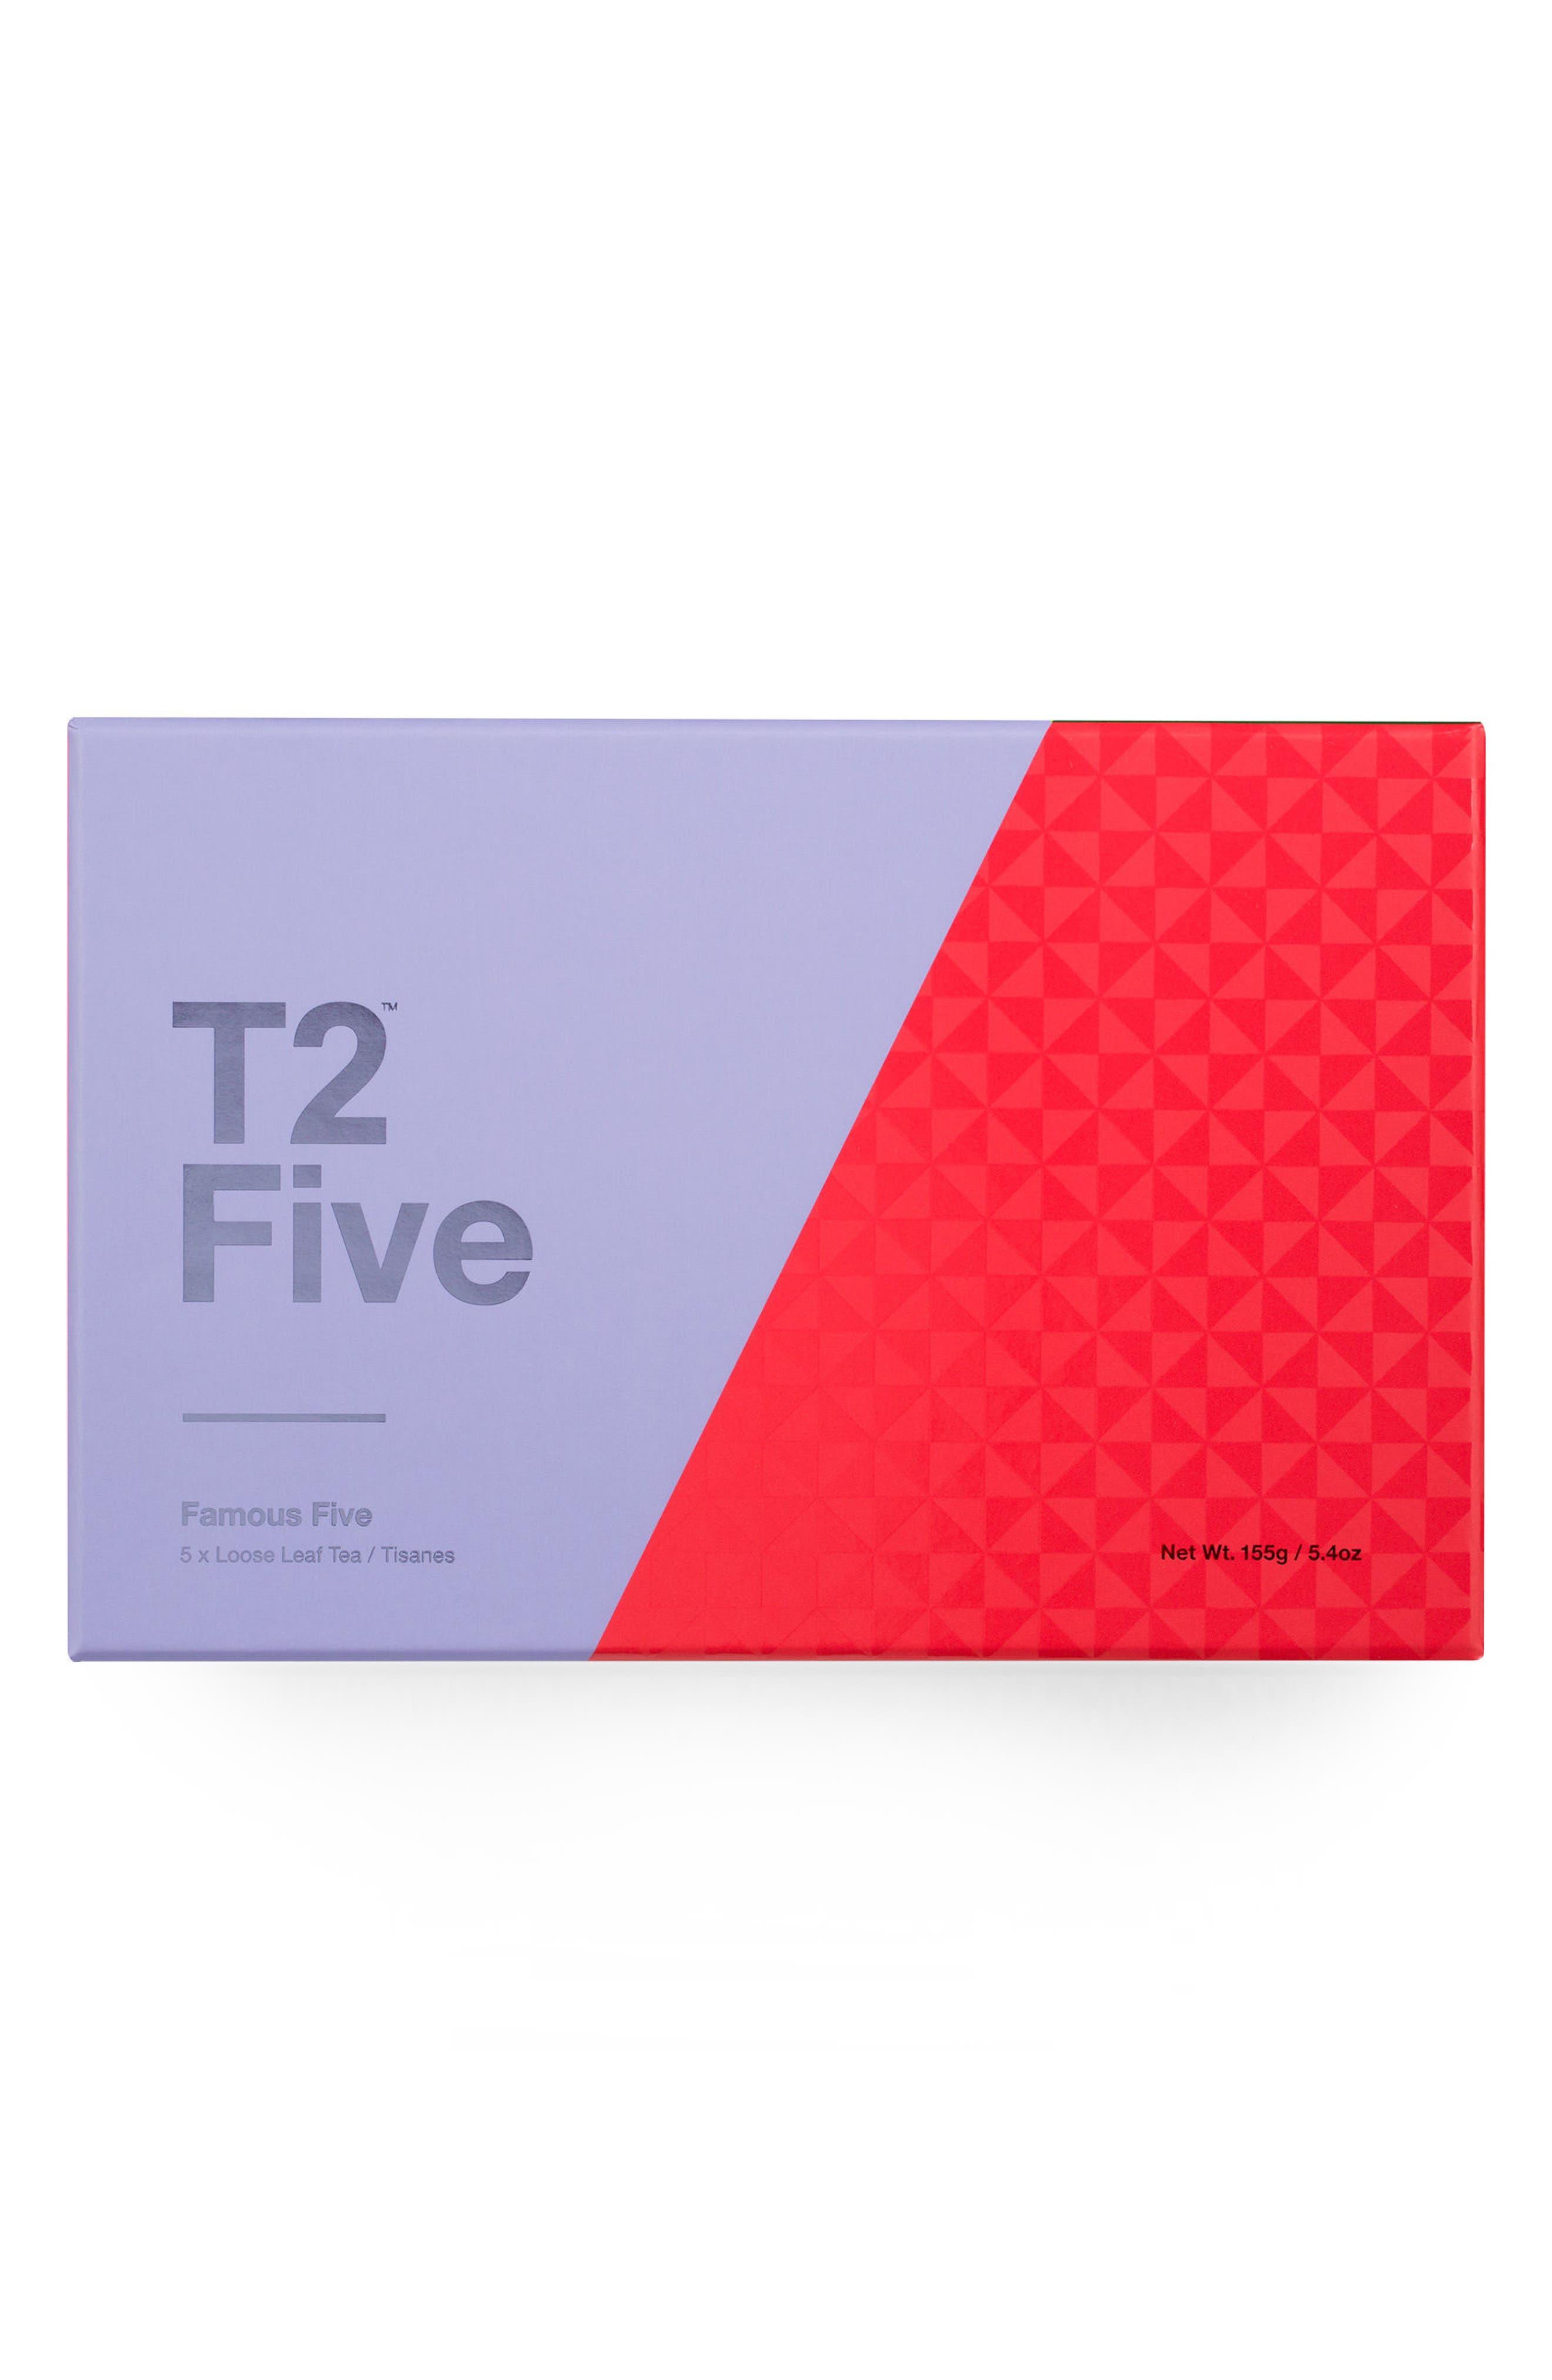 T2 Tea Five Famous Fives Loose Leaf Tea Box Set